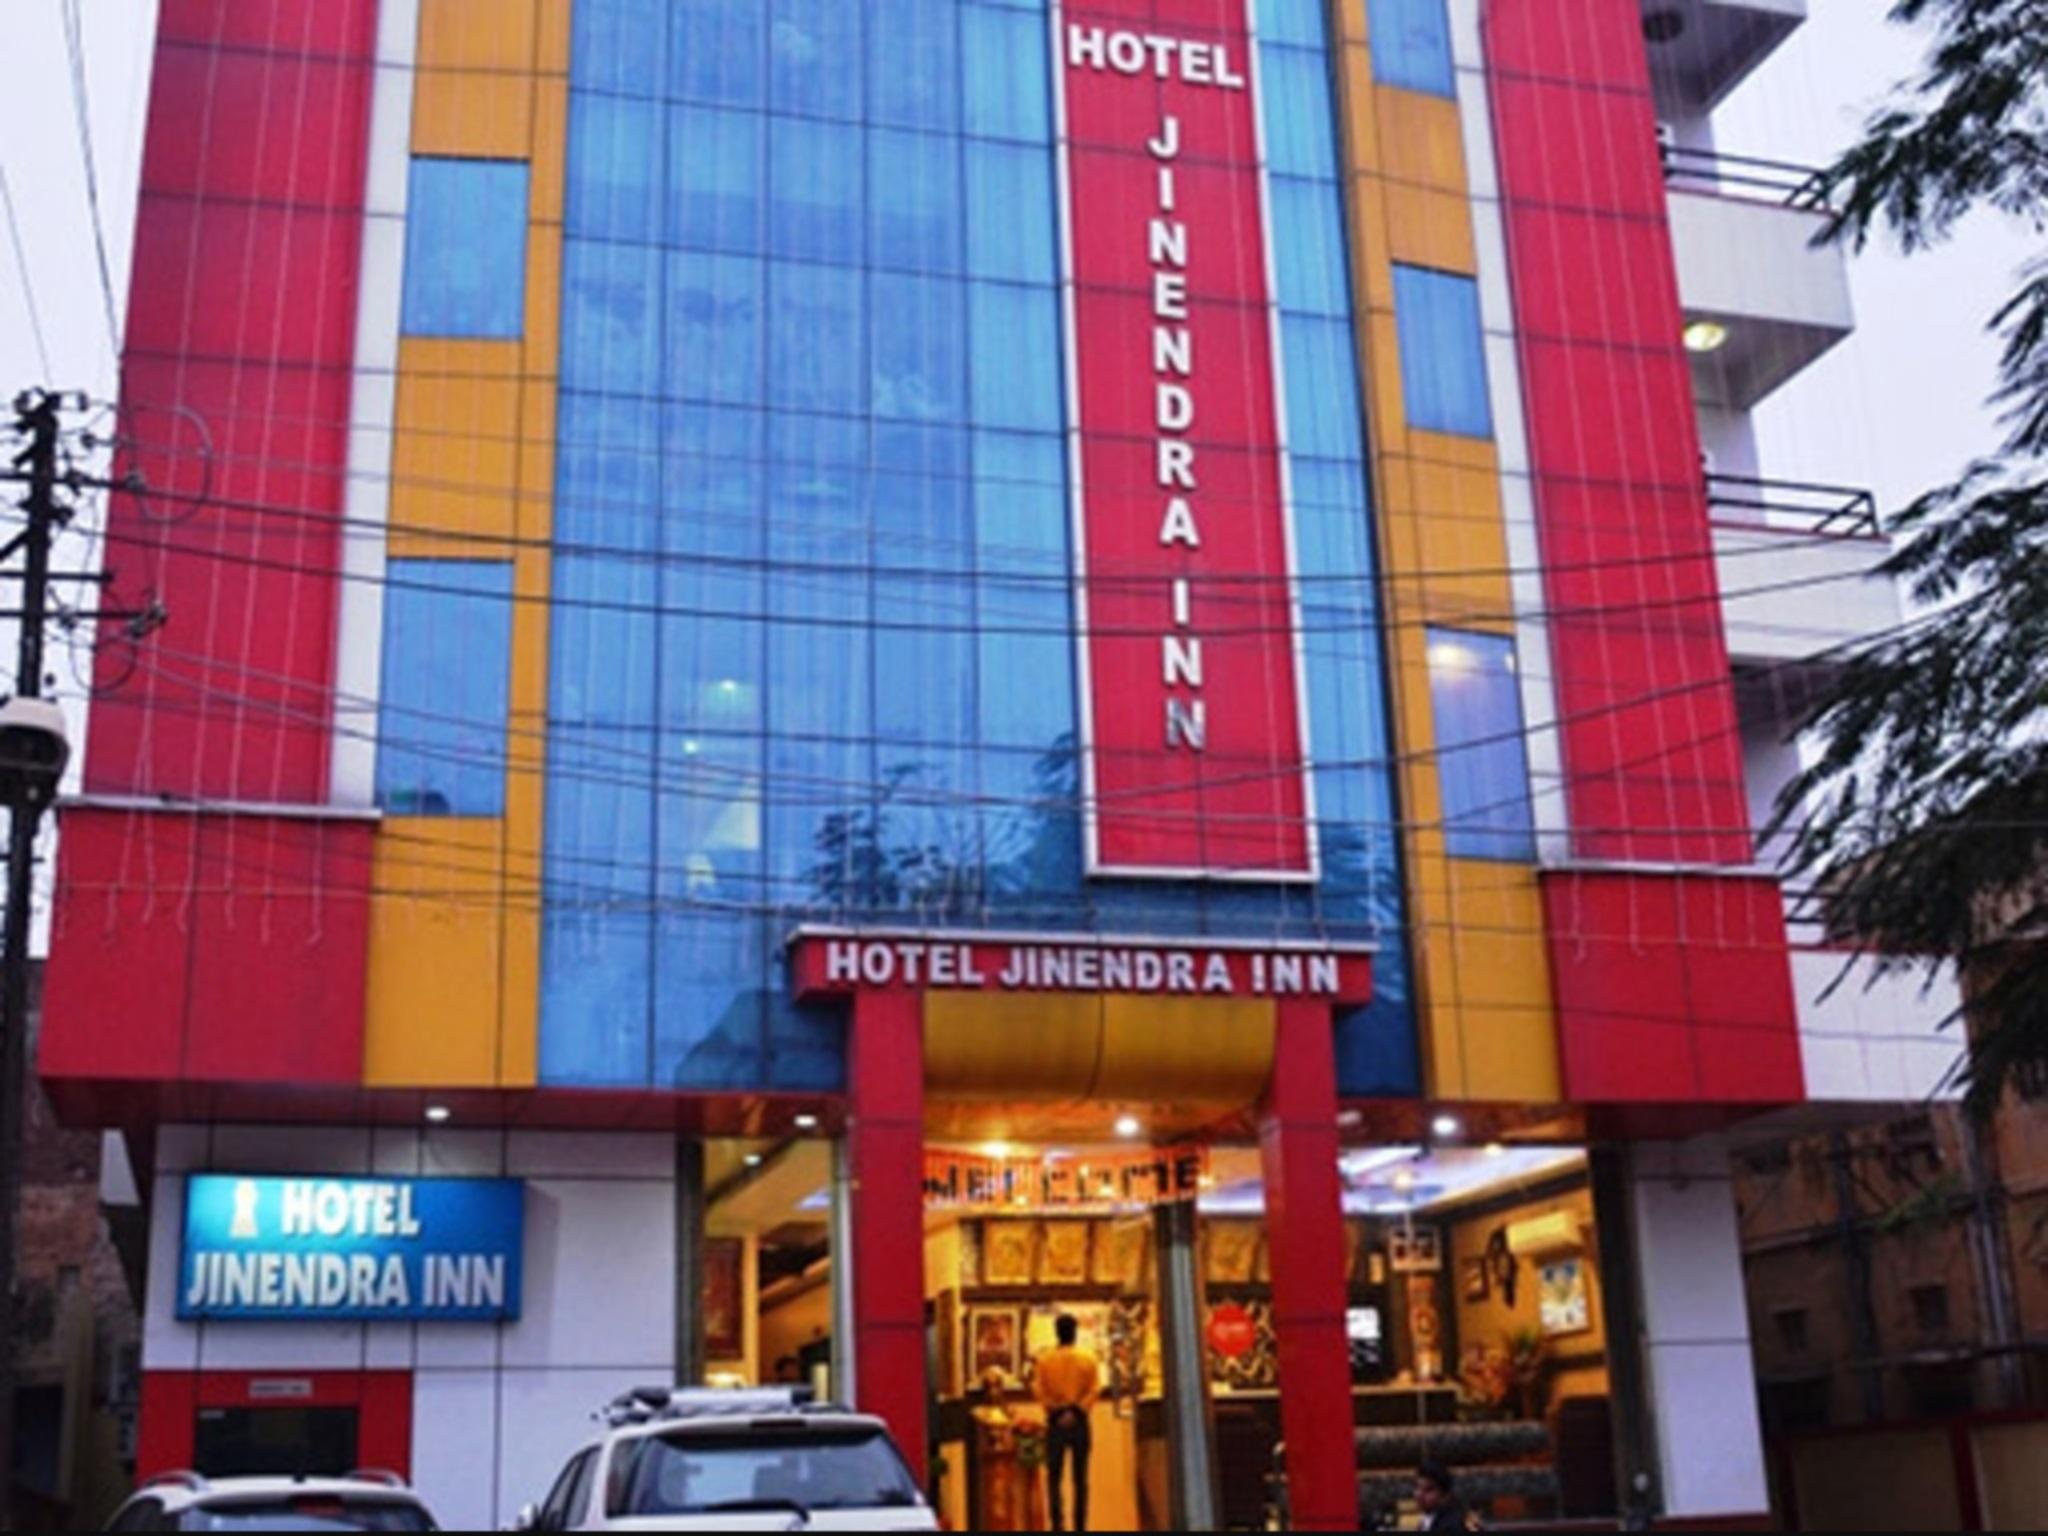 Hotel Jinendra Inn